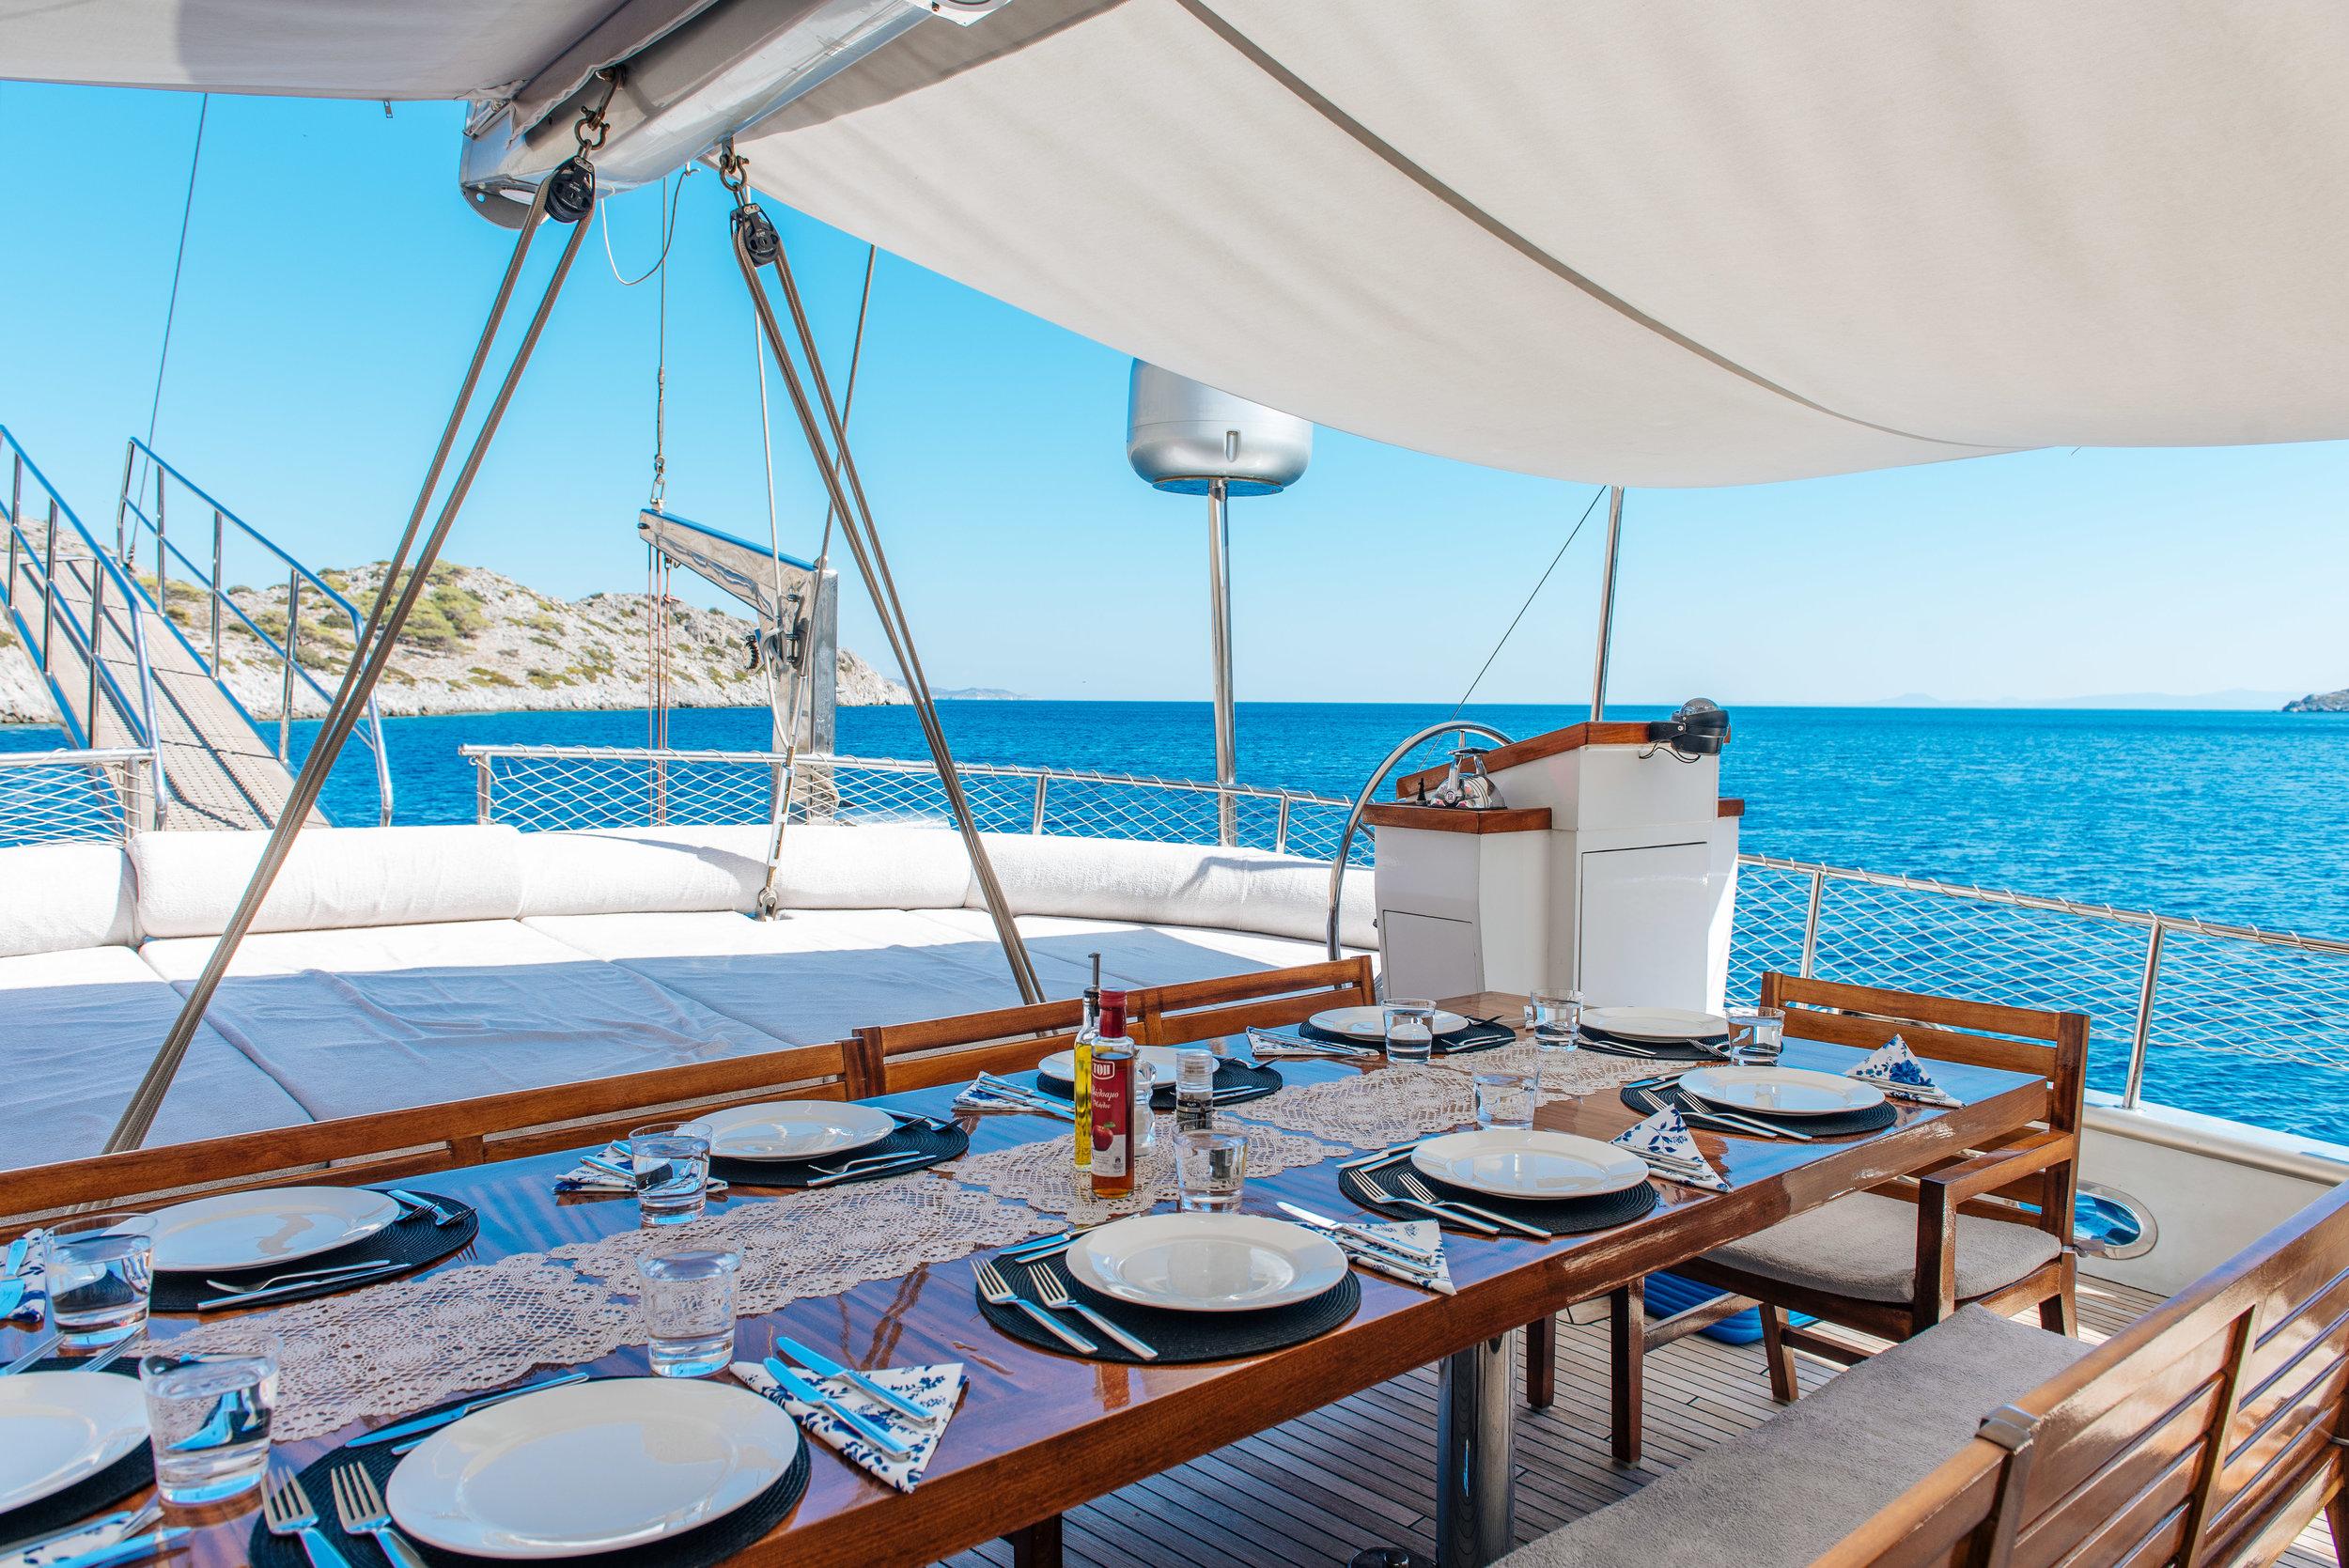 Dubrovnik to Naples: Sail across the Adriatic